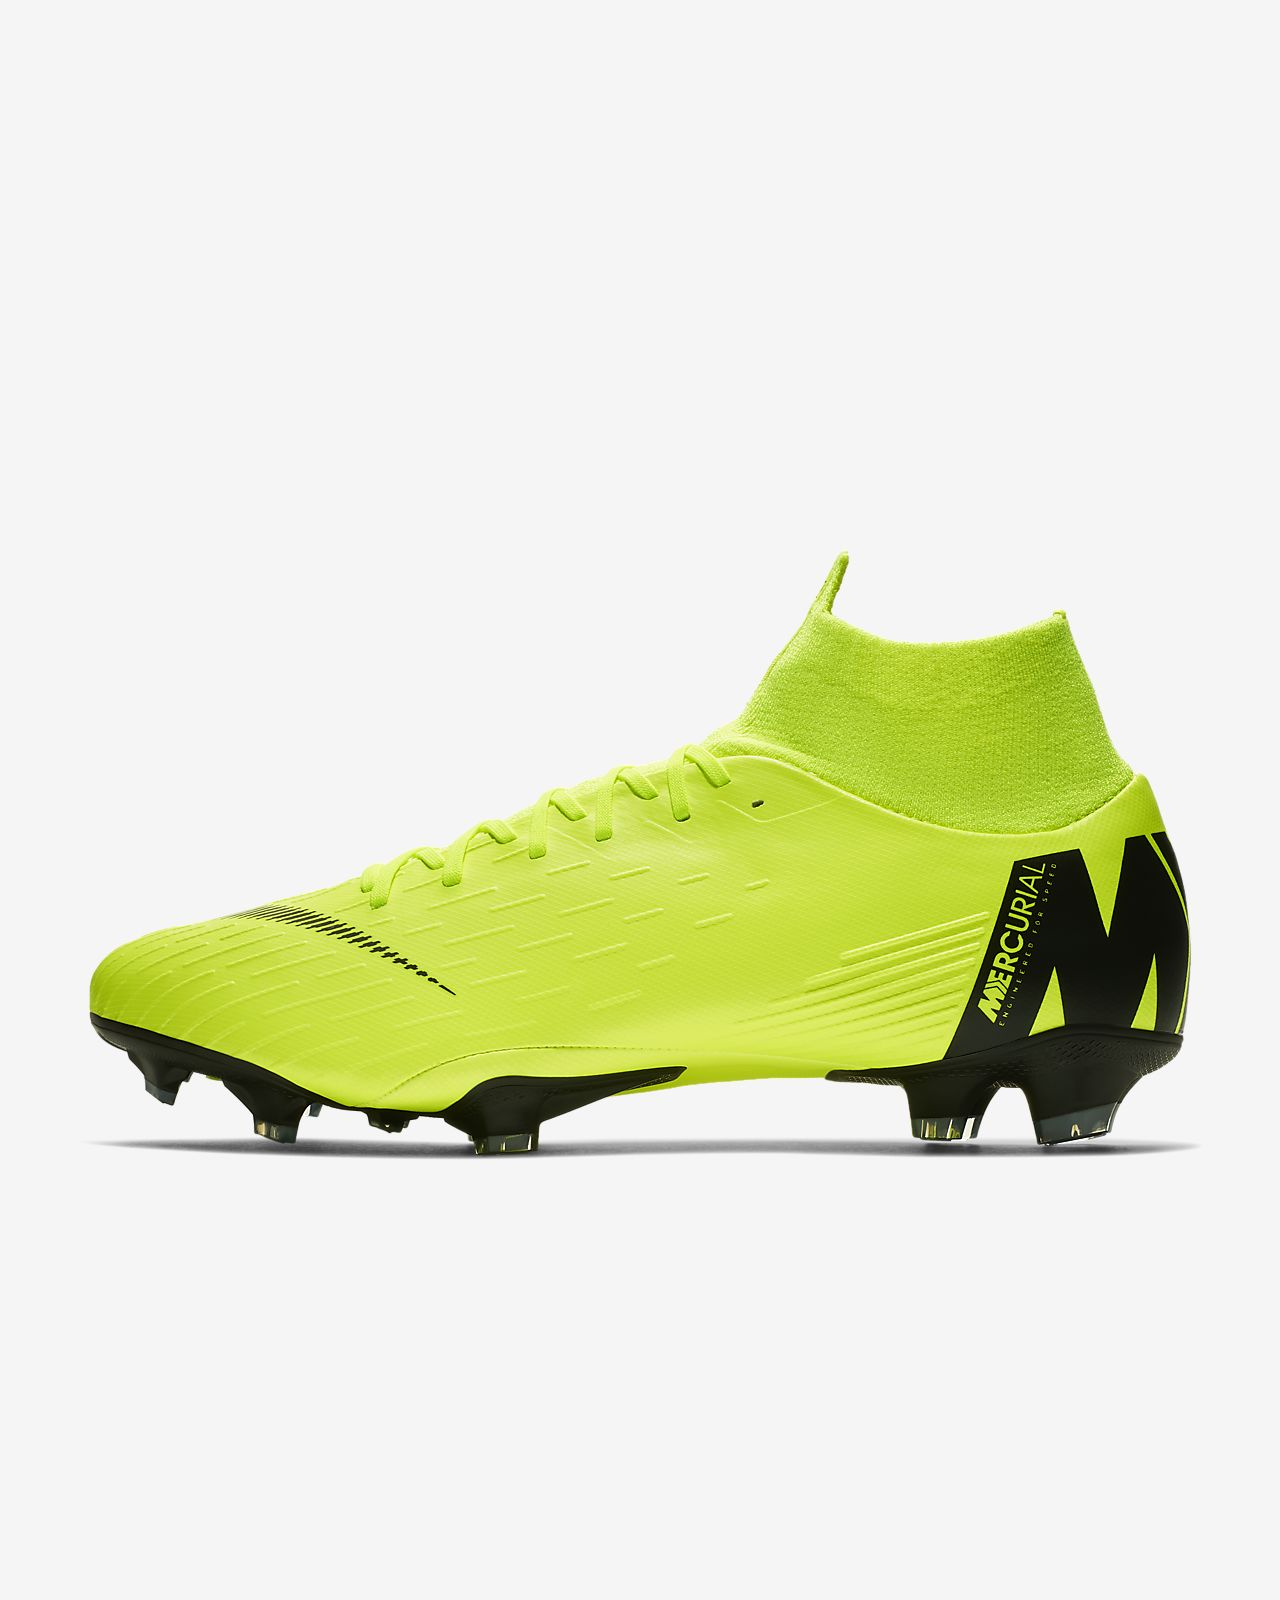 Nike Calzado Fútbol Terreno Pro Firme Mx Fg De Para Superfly 6 wqqOPrXA5x